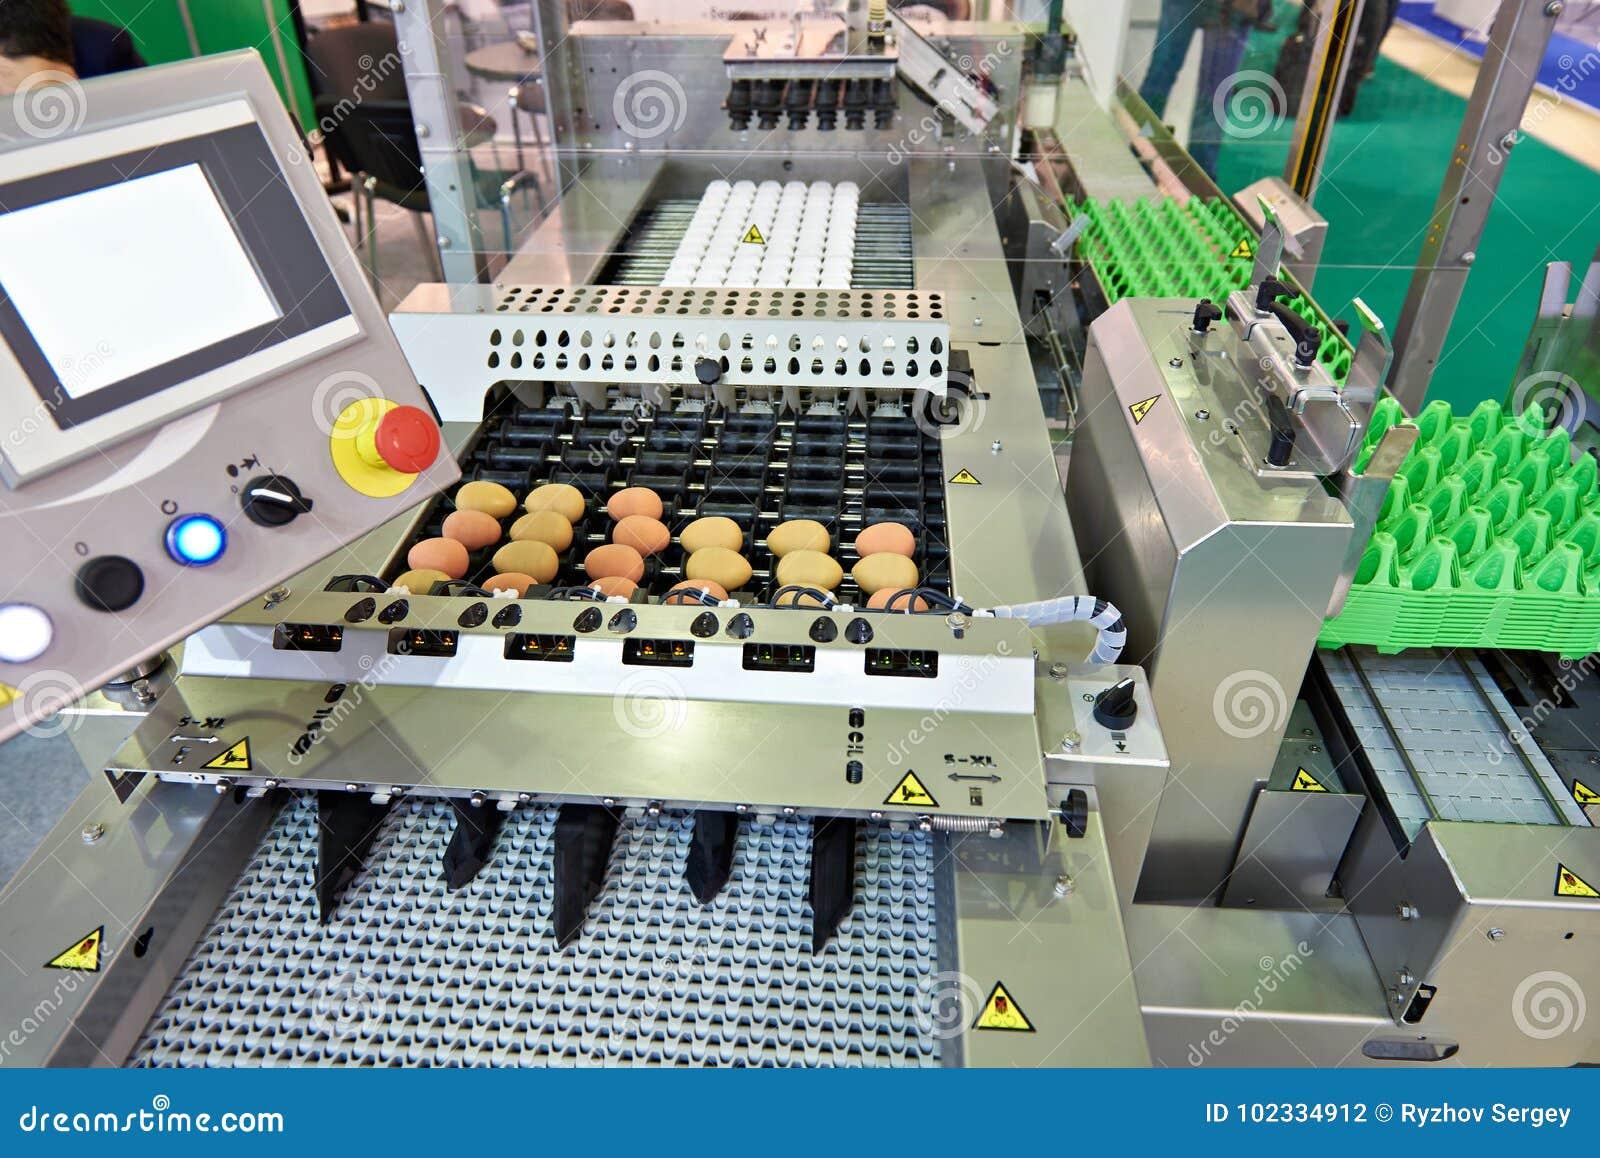 Chicken eggs on conveyor belt at food factory